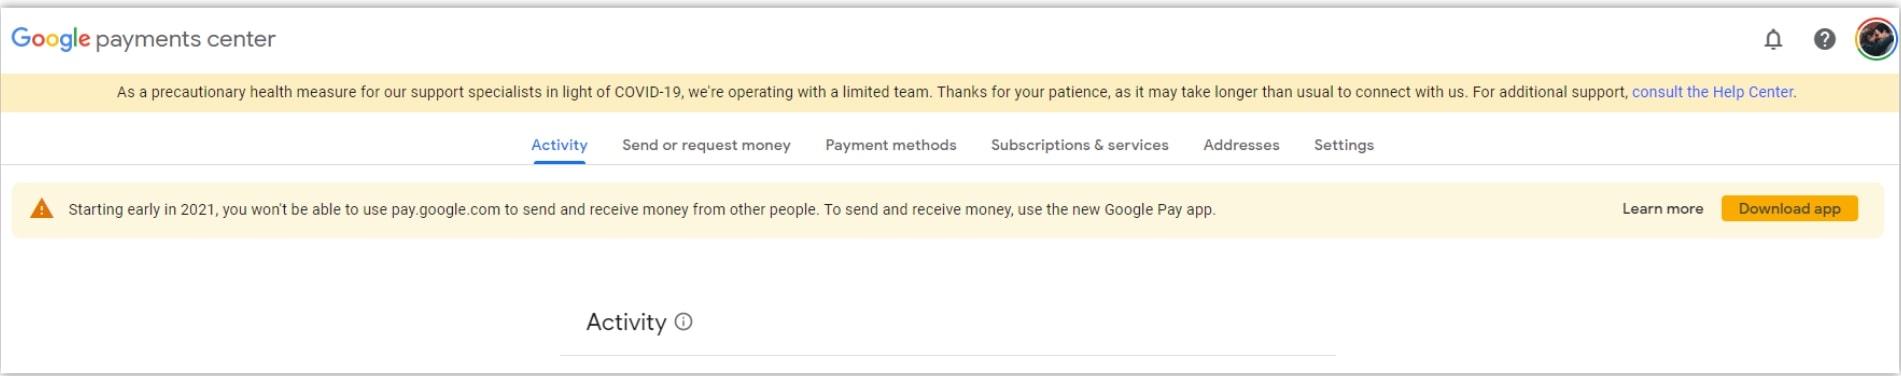 Google pay web app